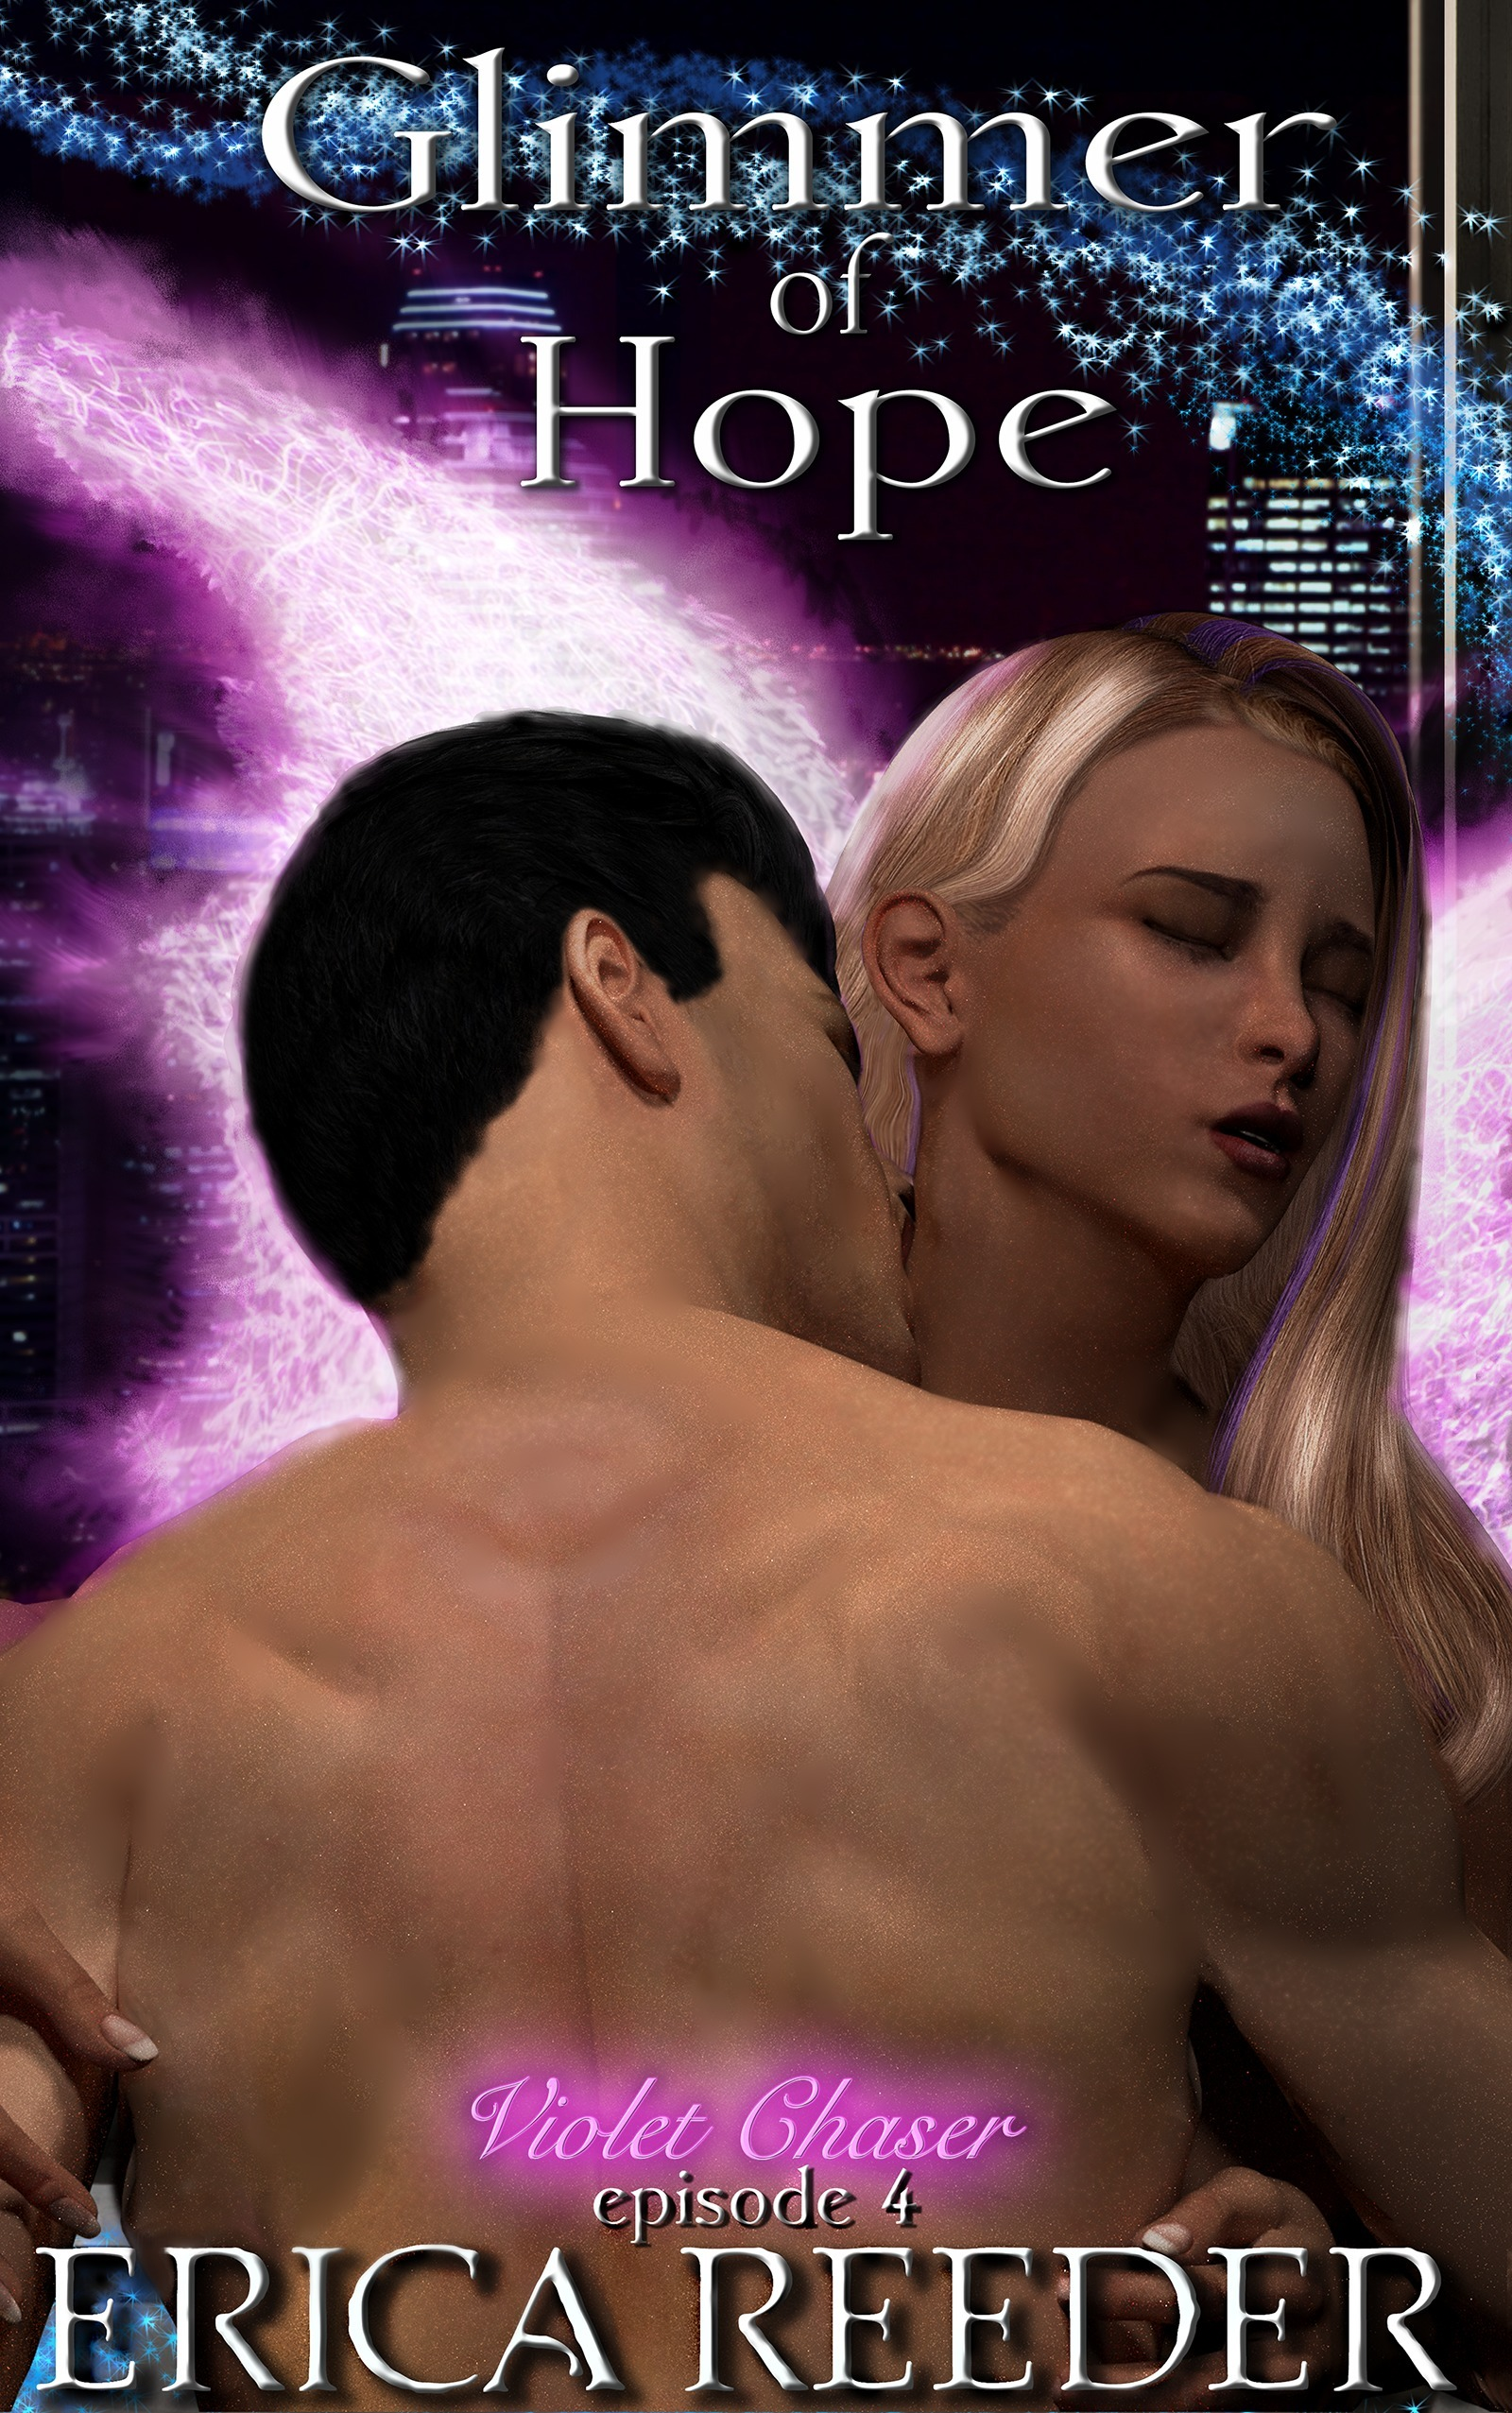 Glimmer Of Hope (Violet Chaser Series, Episode 4)  by  Erica Reeder